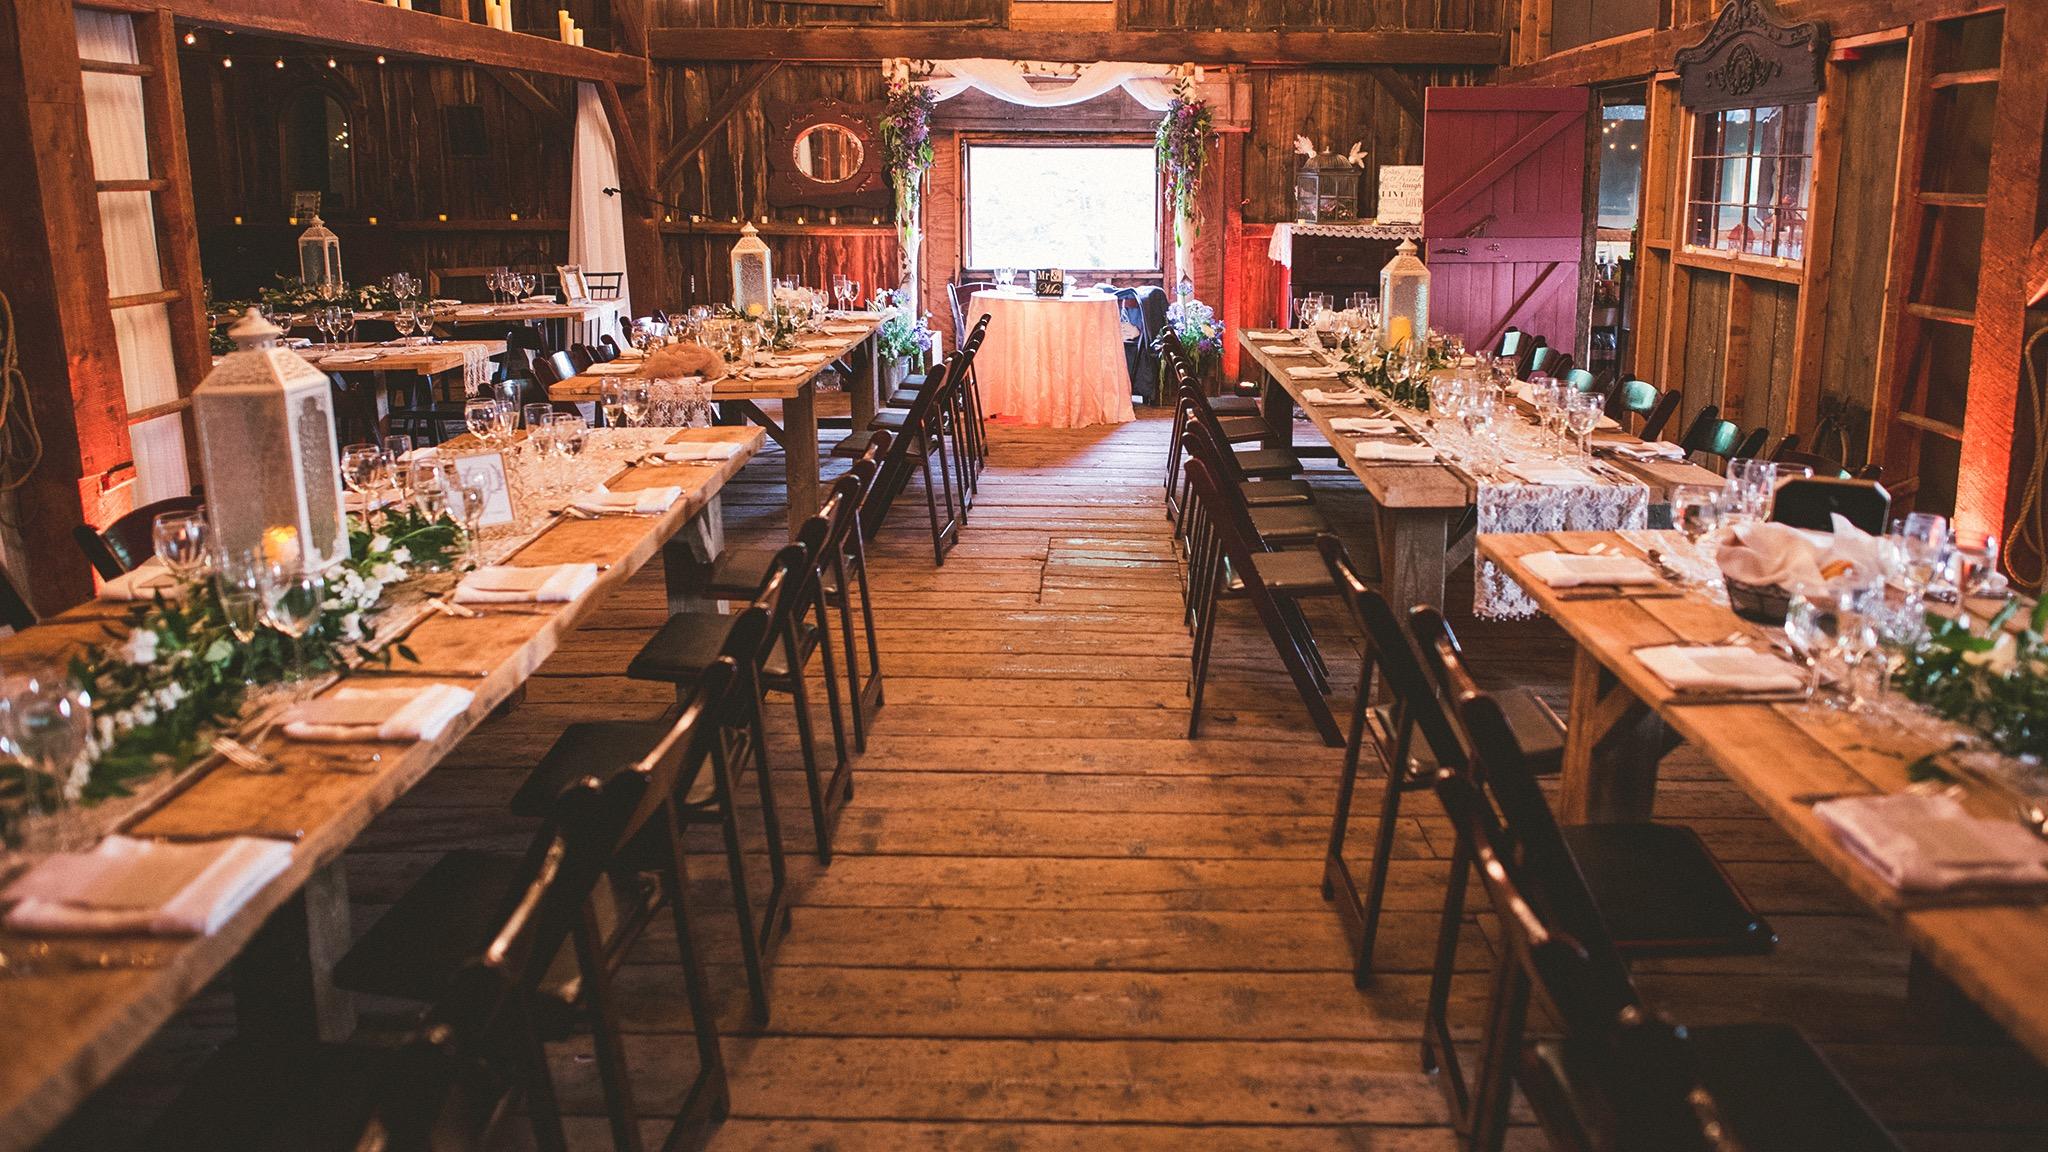 76-jacks-barn-wedding-reception.jpg